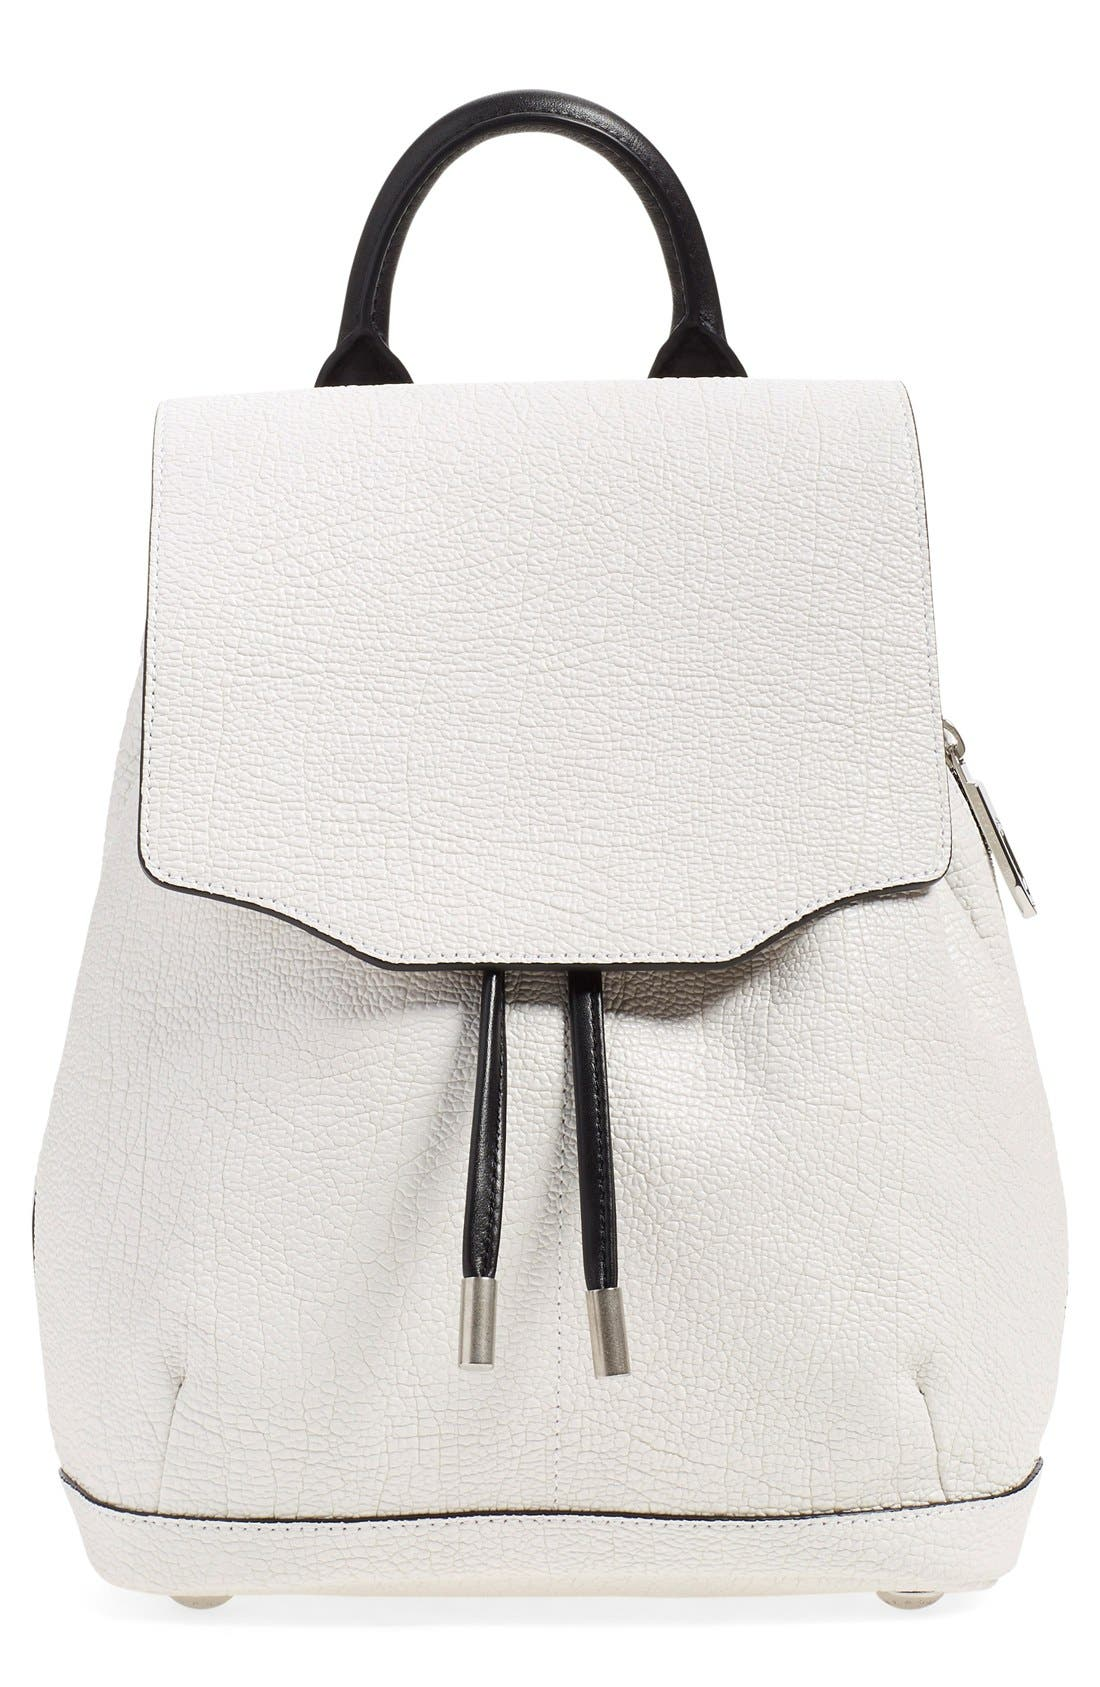 Alternate Image 1 Selected - rag & bone 'Mini Pilot' Leather Backpack